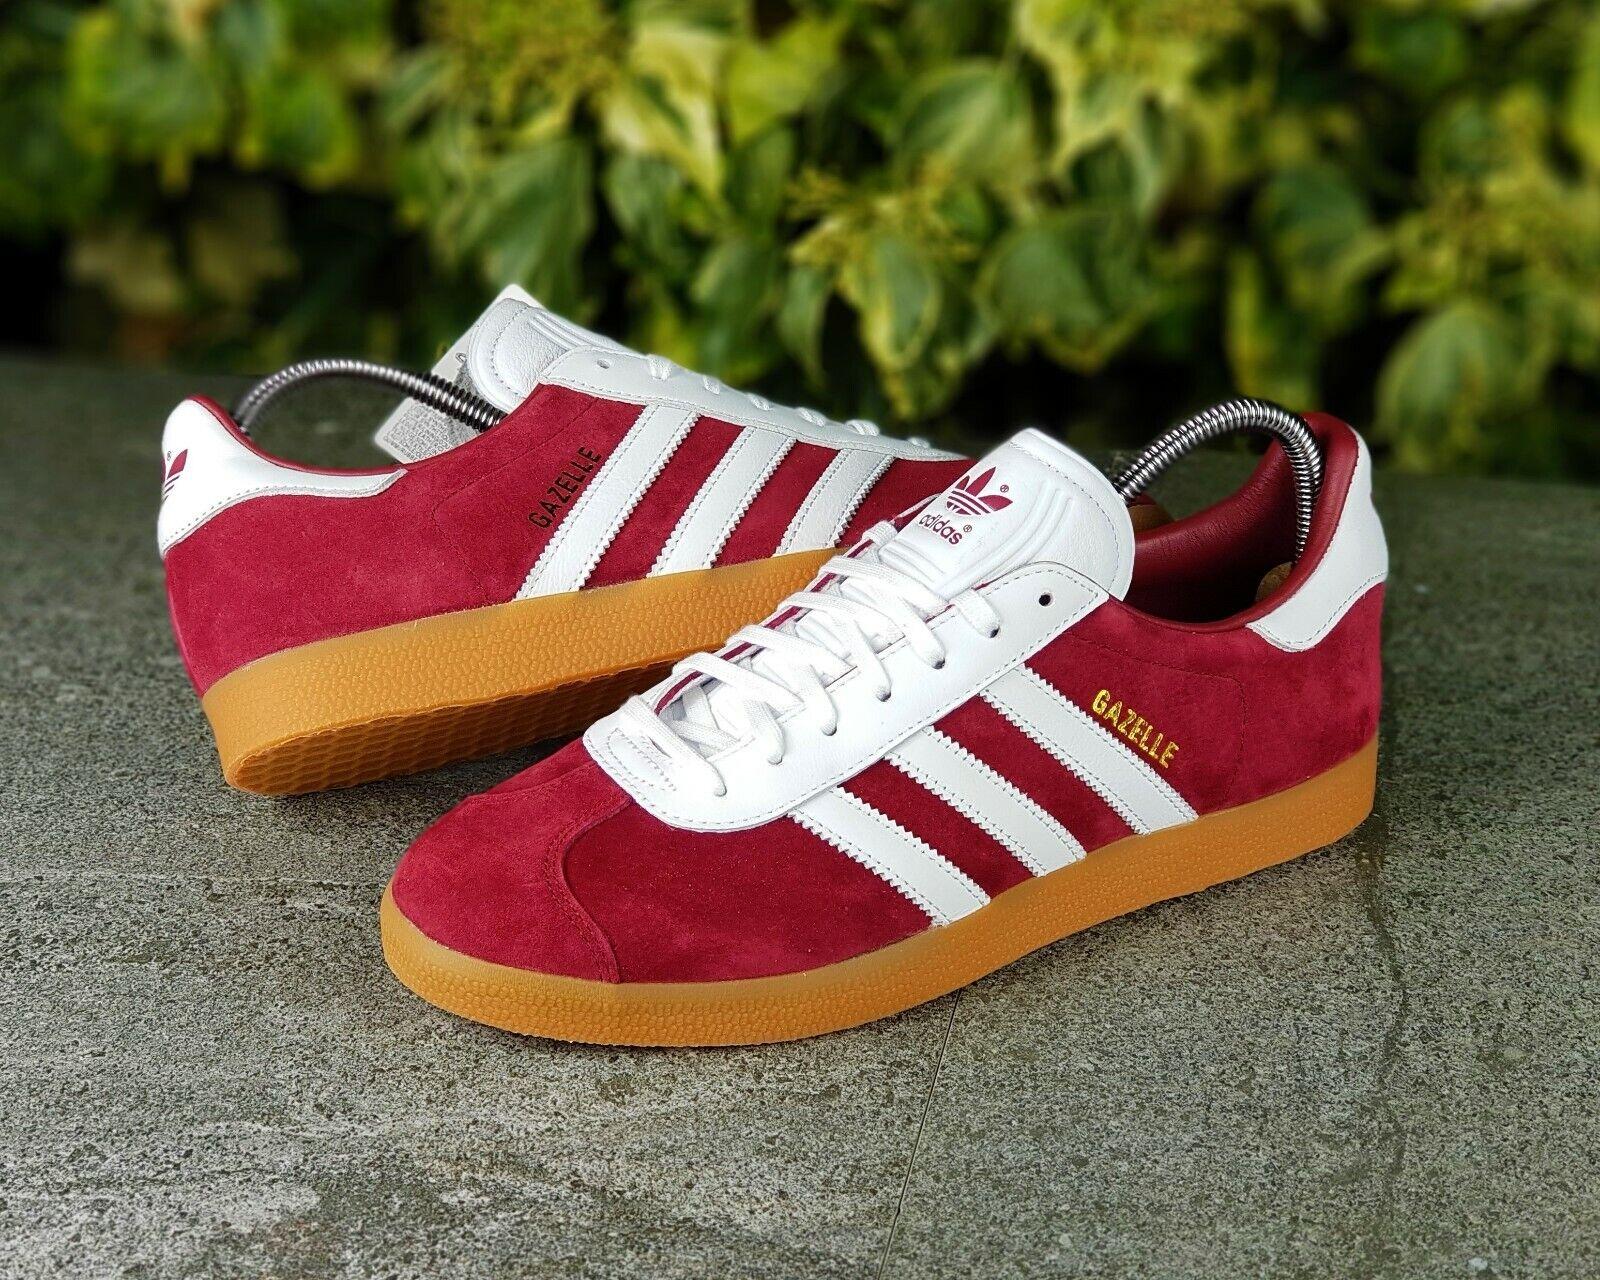 BNWB & & & Genuine Adidas Originals ® Gazelle  Athen  in pelle scamosciata scarpe da ginnastica bc02f1